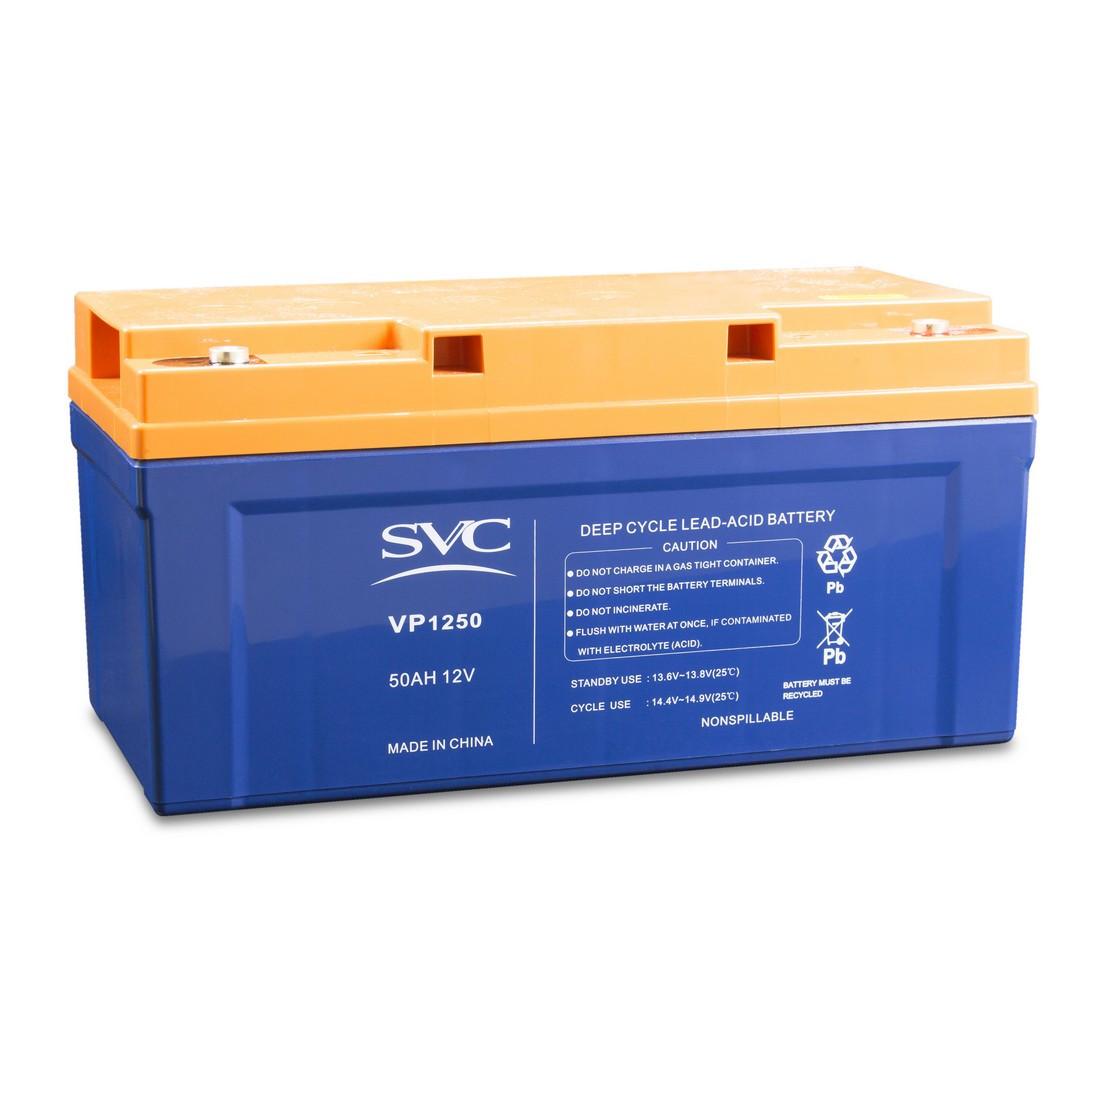 Батарея свинцово-кислотная SVC VP1250 (12В, 50 Ач)